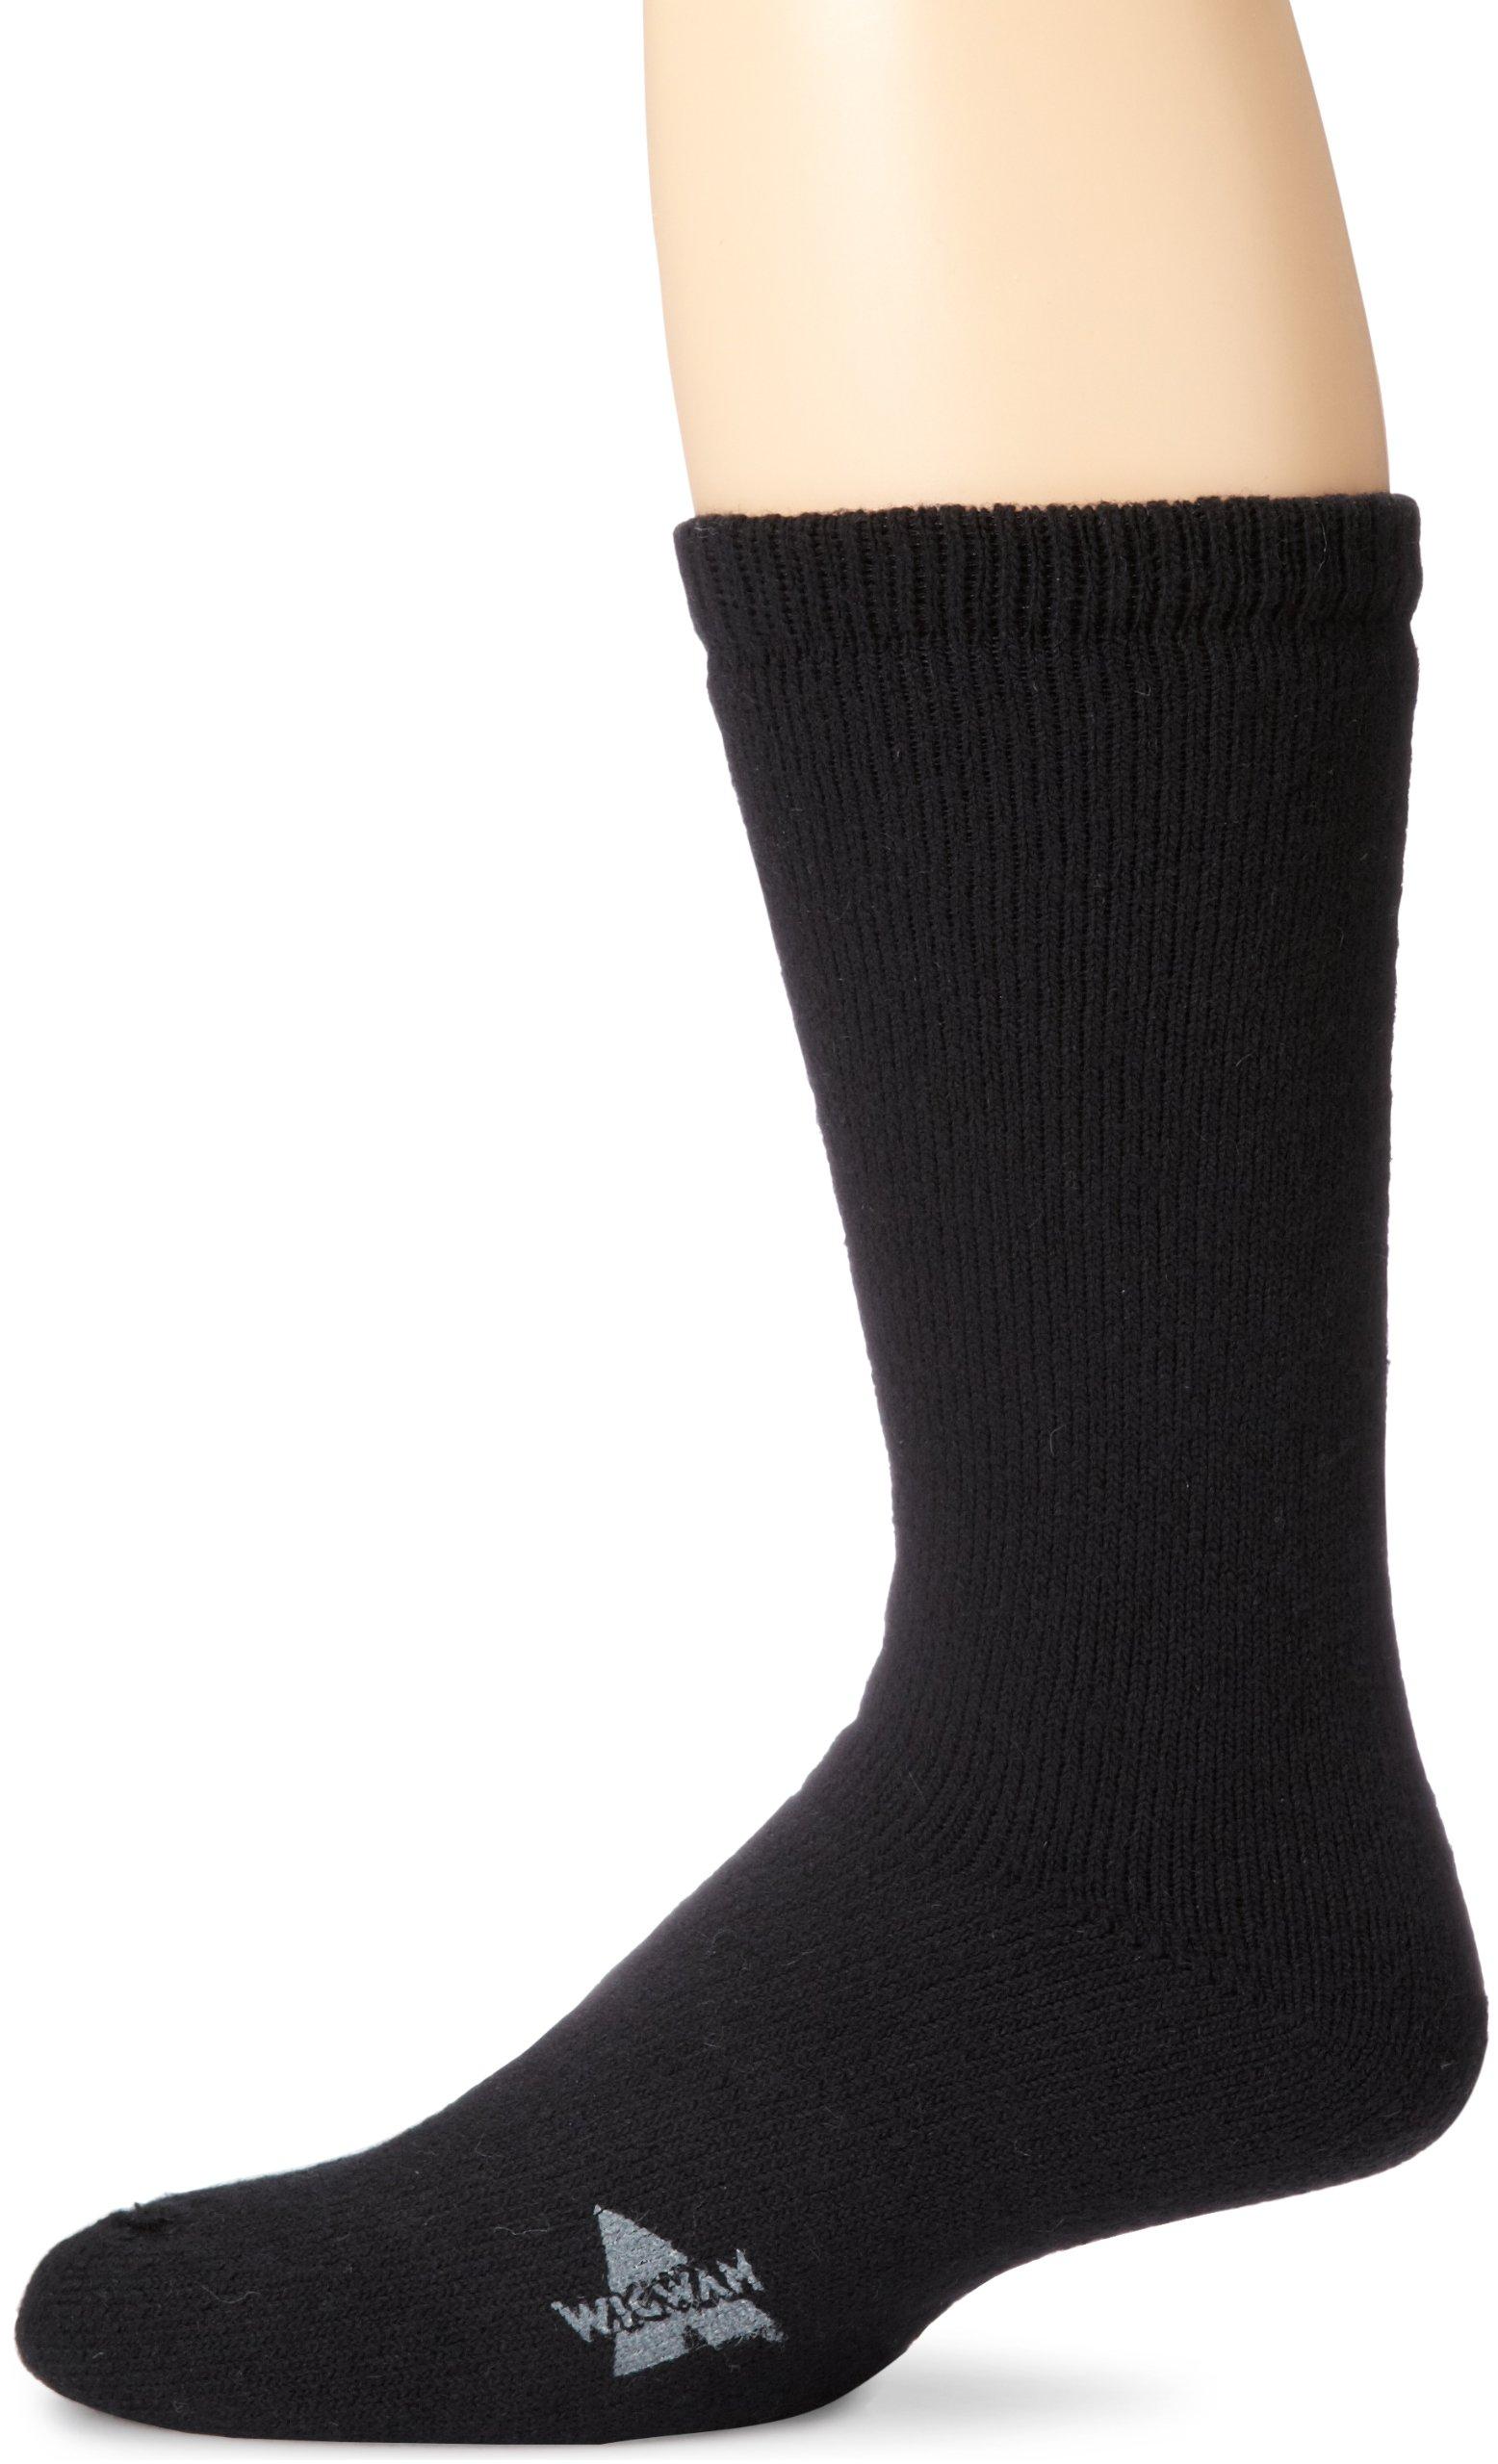 Wigwam Men's 40 Below Heavyweight Boot Socks, Black, Large